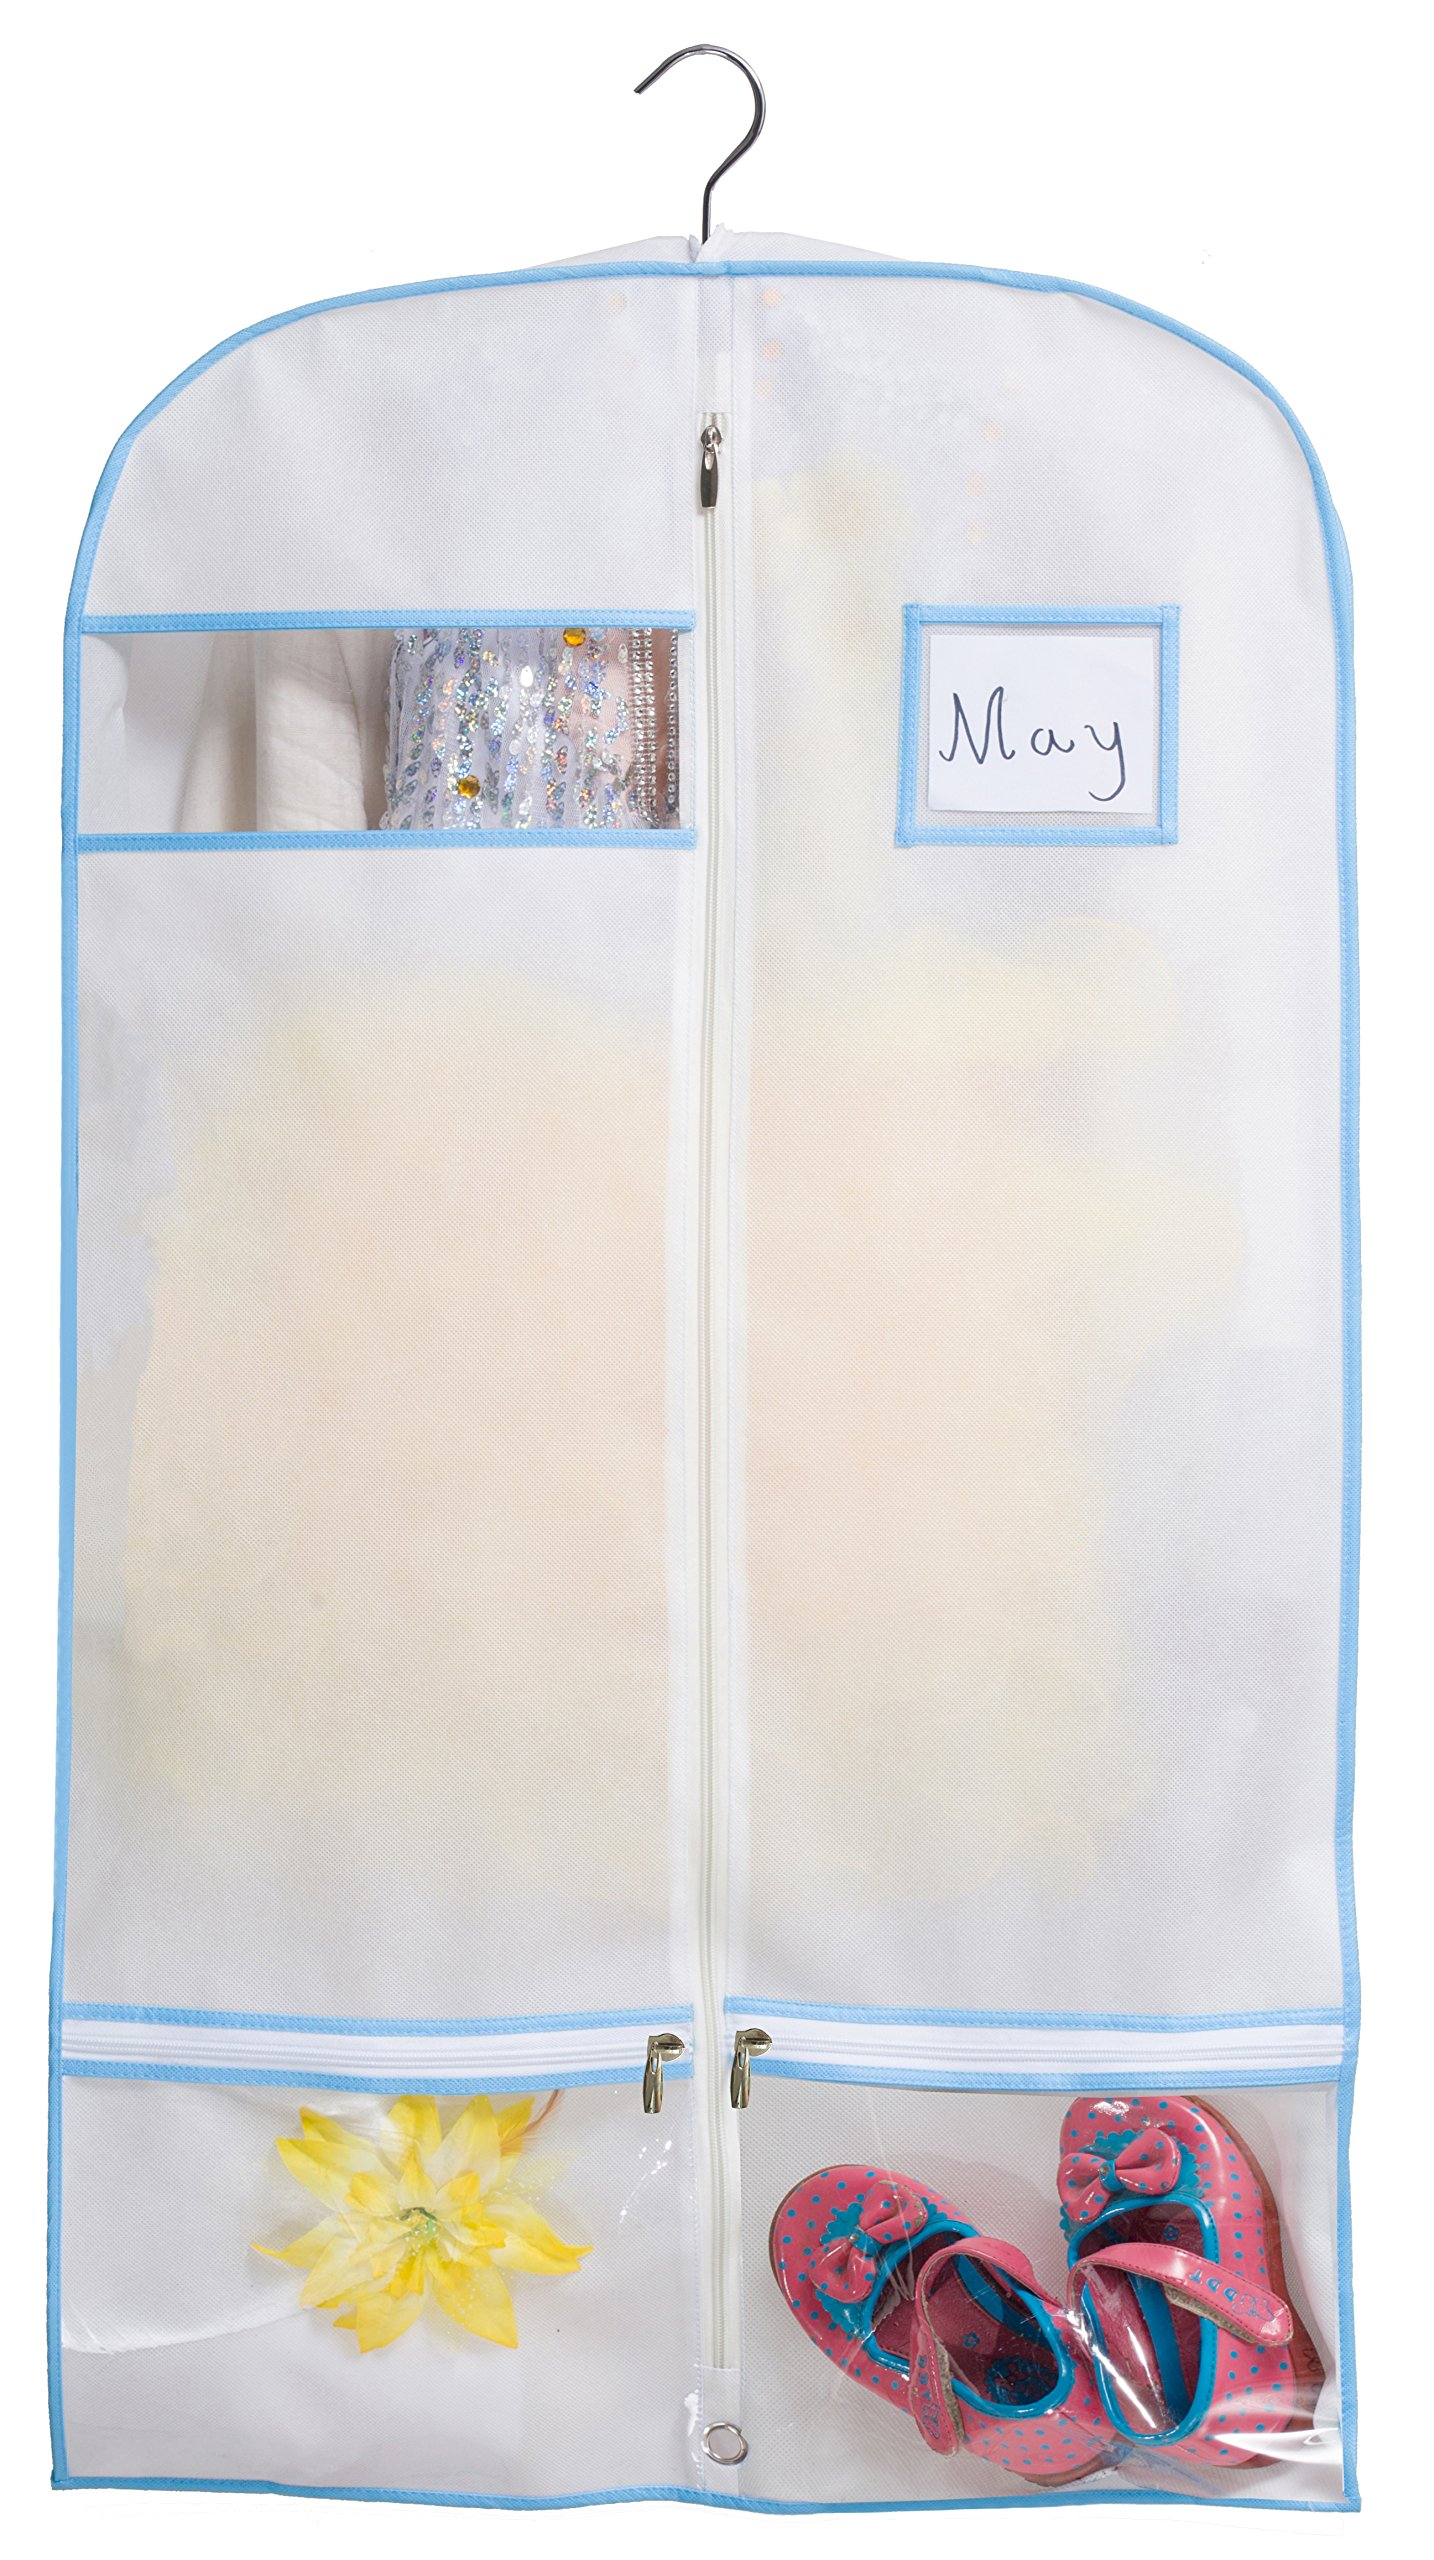 Kimbora 40'' Travel Dance/Dress Costume Garment Bag with Clear Accessories Zipper Pockets Suit Garment Cover (White) by KIMBORA (Image #2)